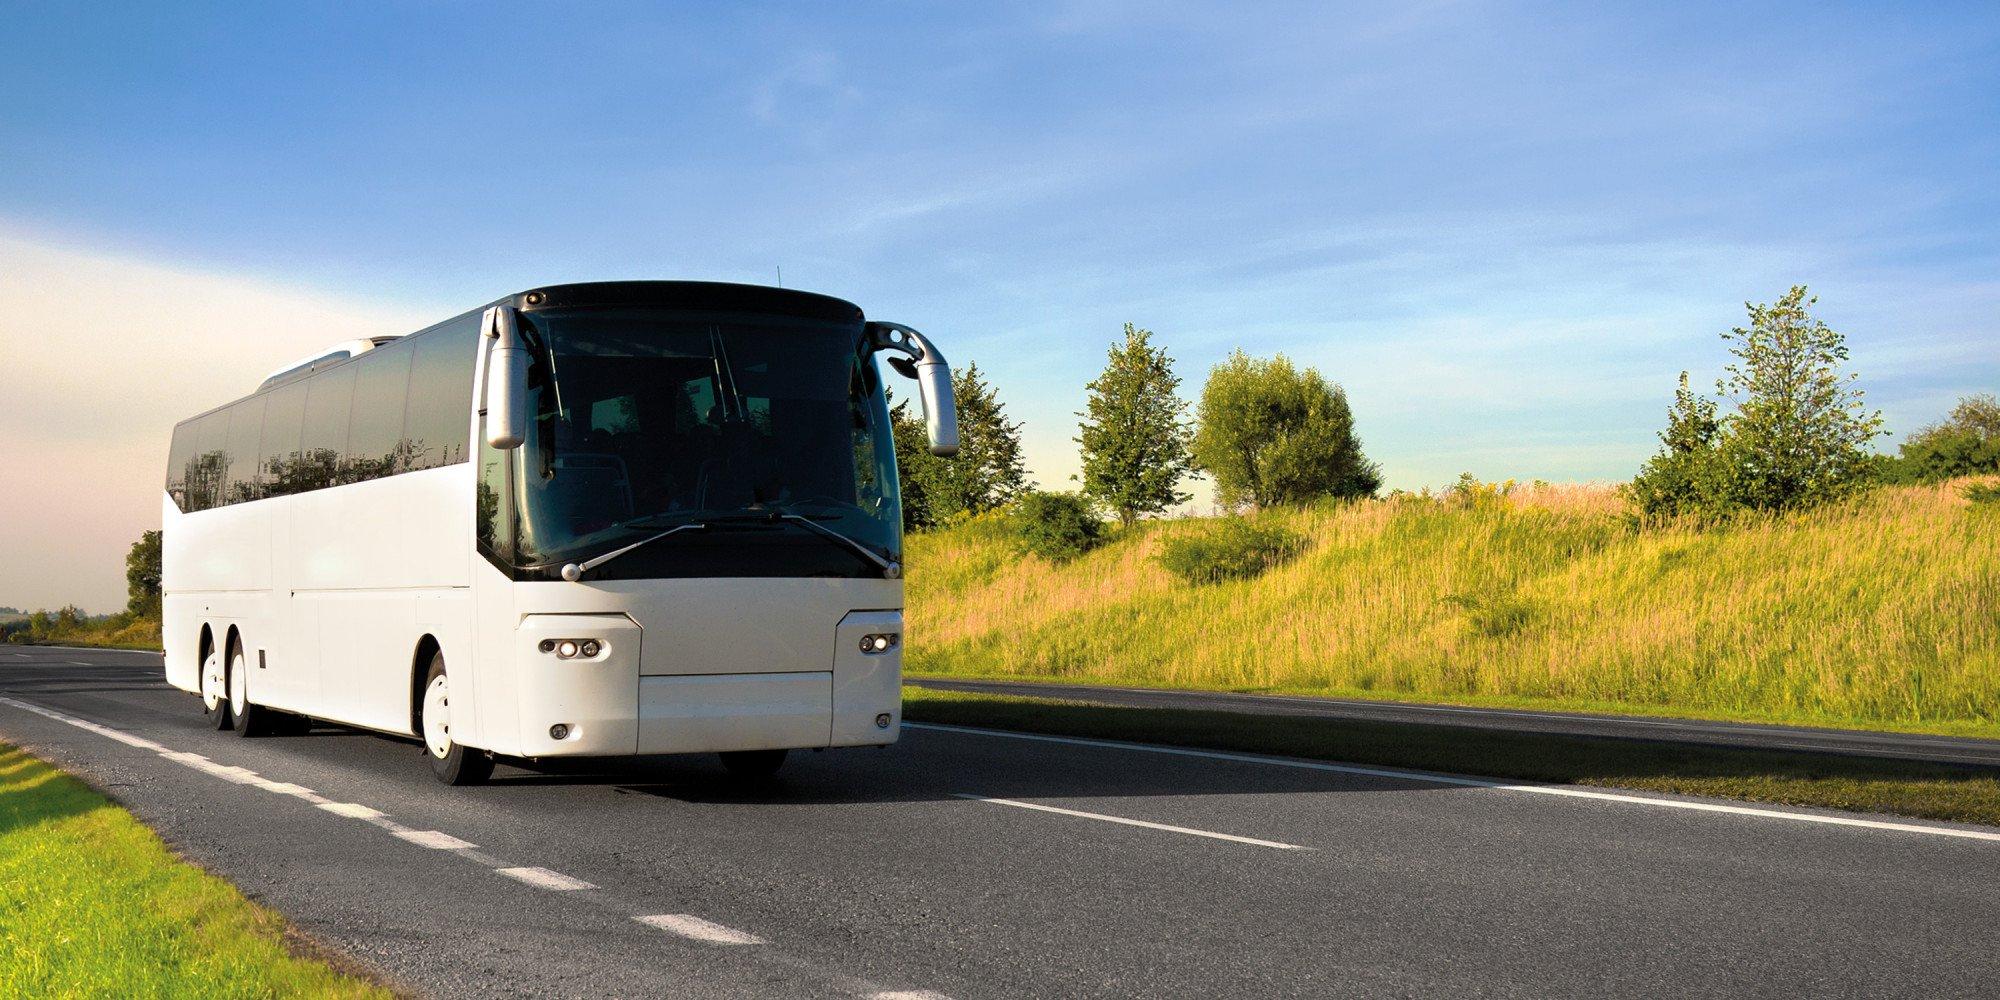 Pilihan Armada Terlengkap - Cari Sewa Bus Pariwisata Murah? Di Sini Solusinya!